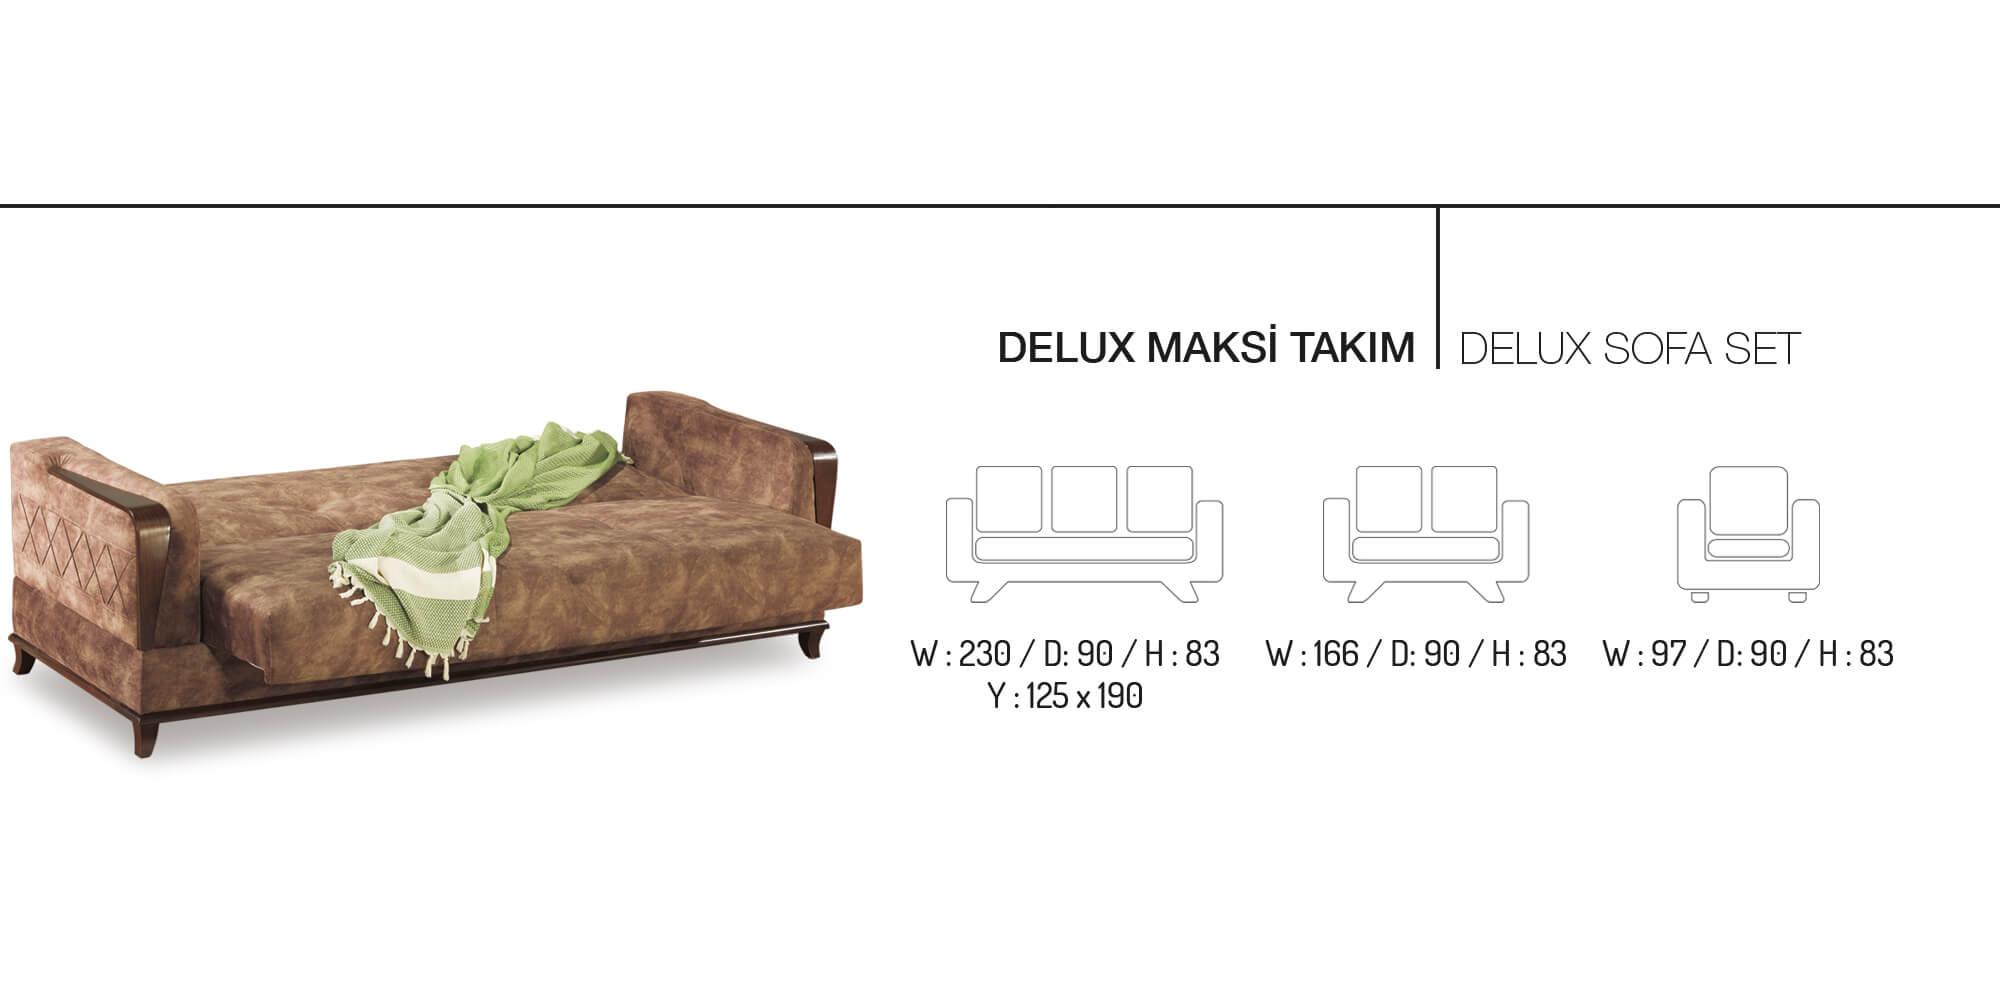 tone-deluxe-sofa-set-4